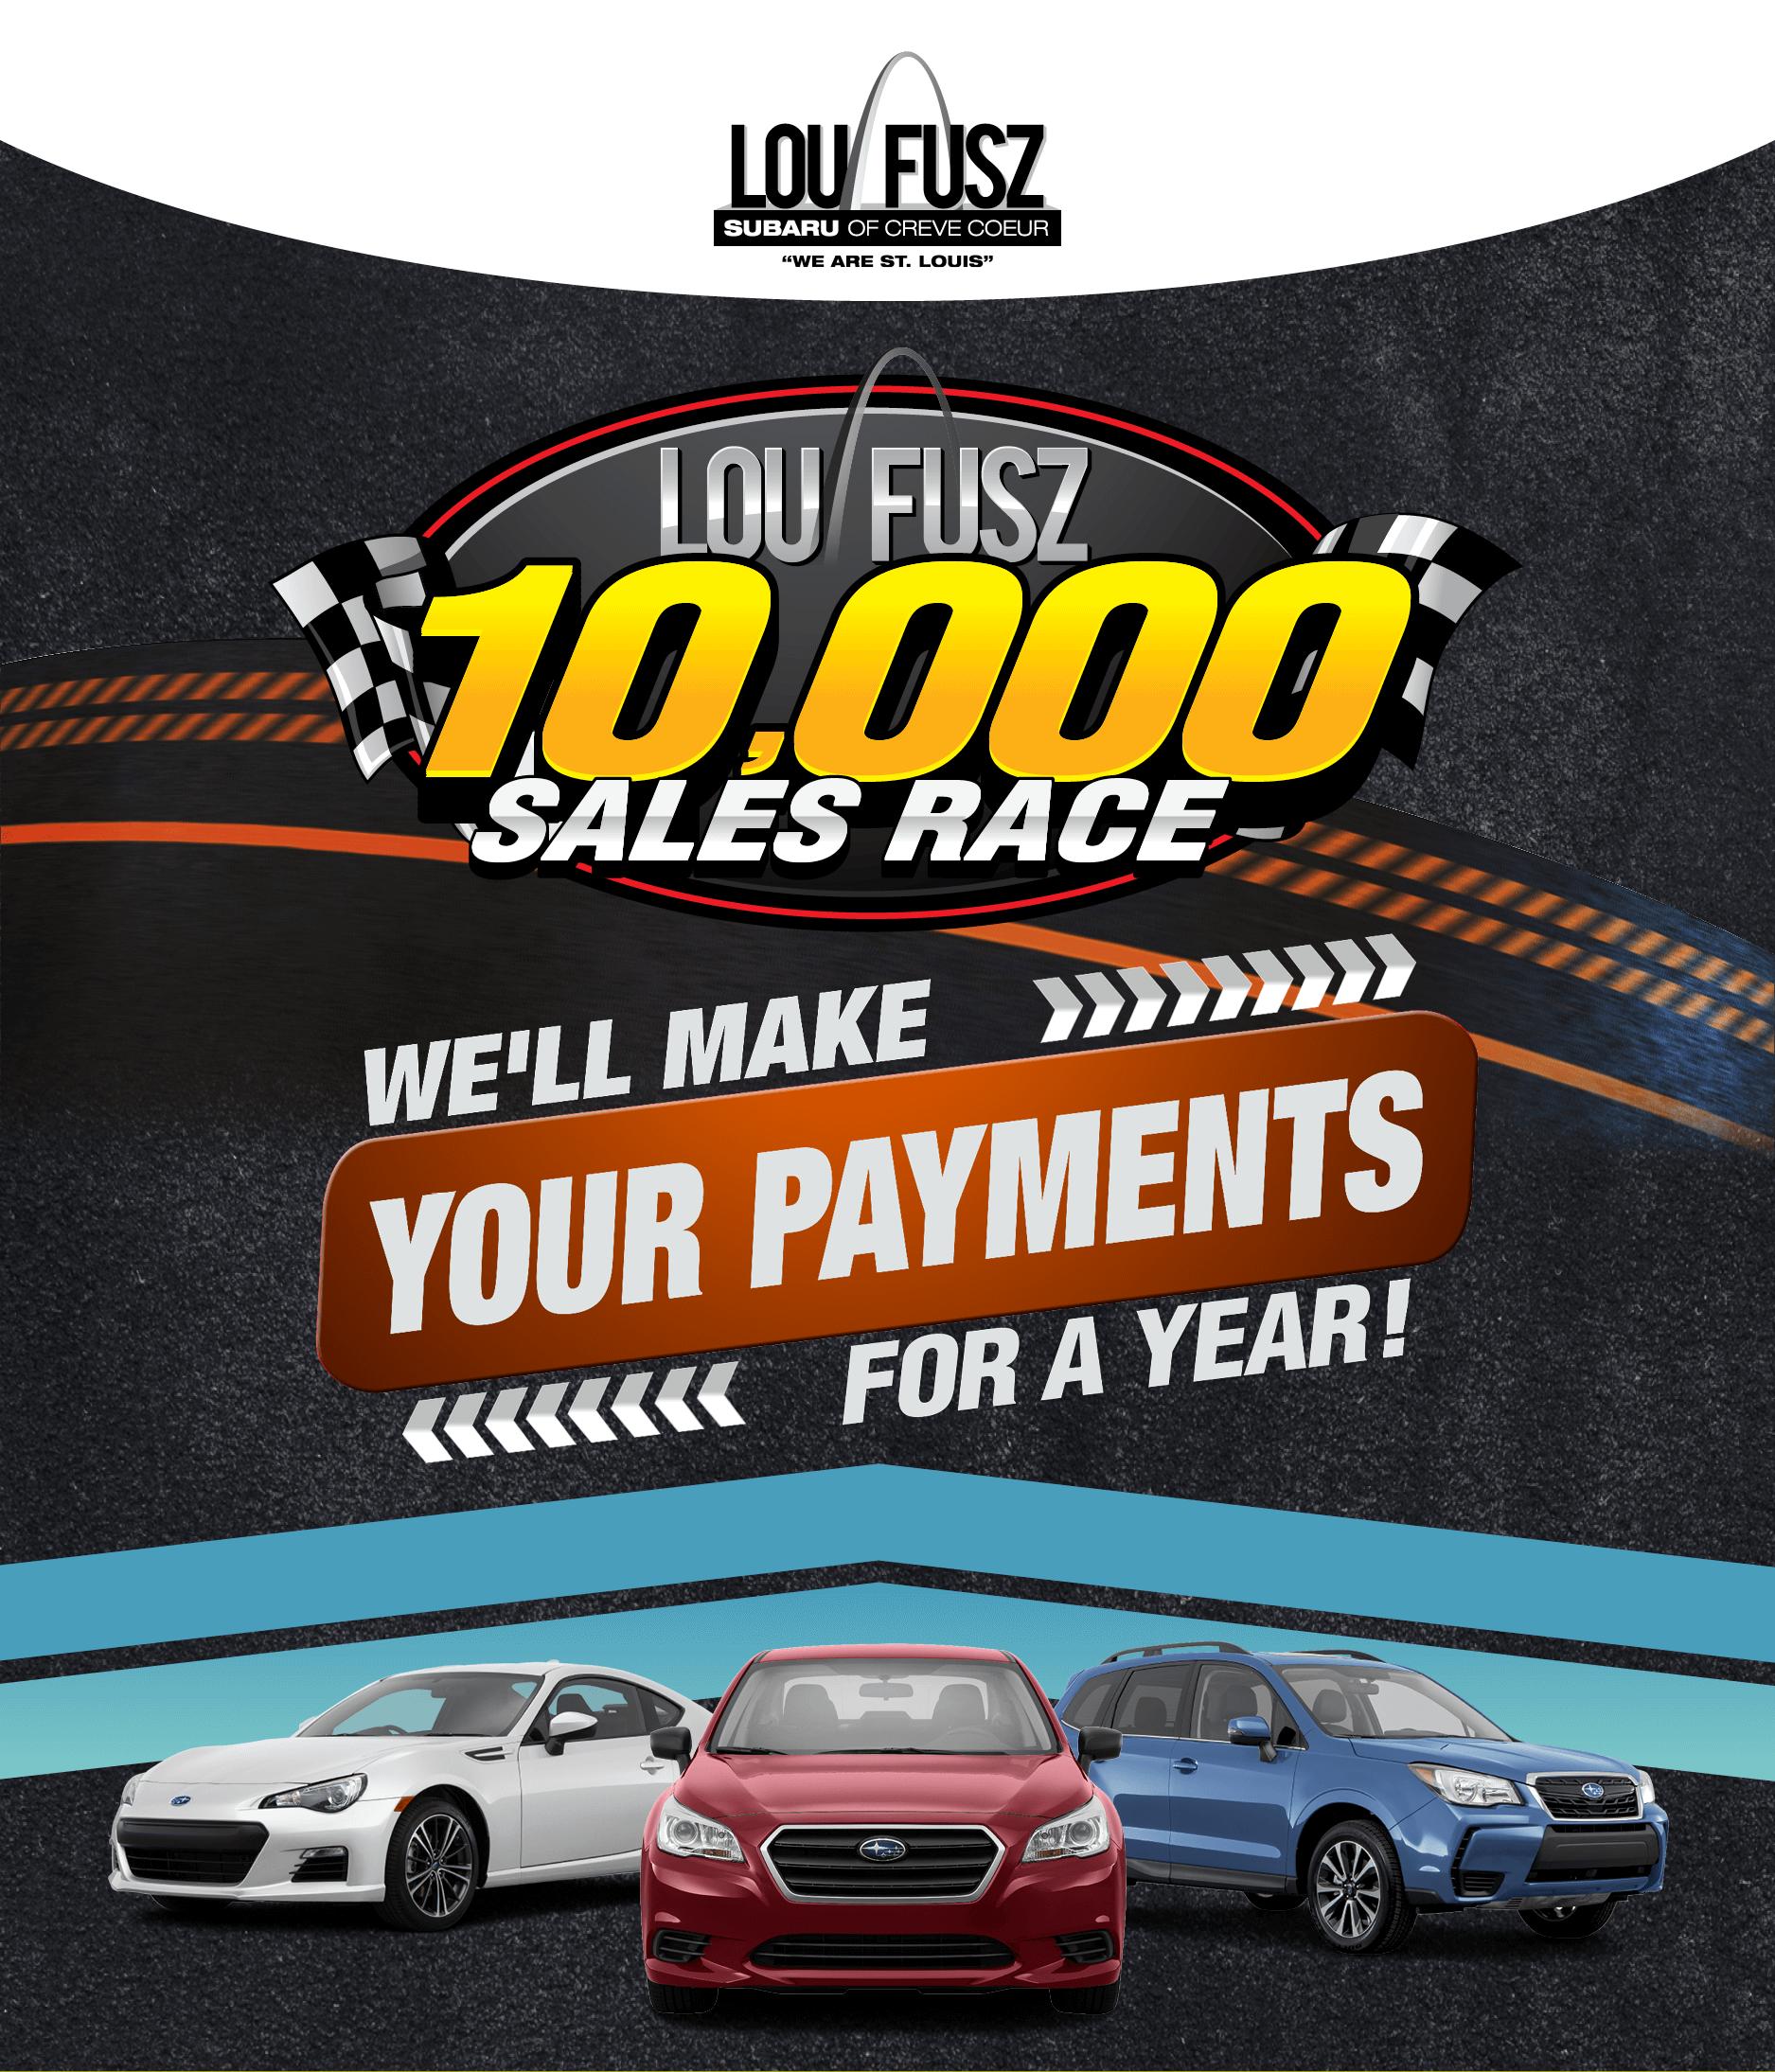 Subaru Dealer St Louis >> Lou Fusz 10K Sales Race   Lou Fusz Subaru - St Louis